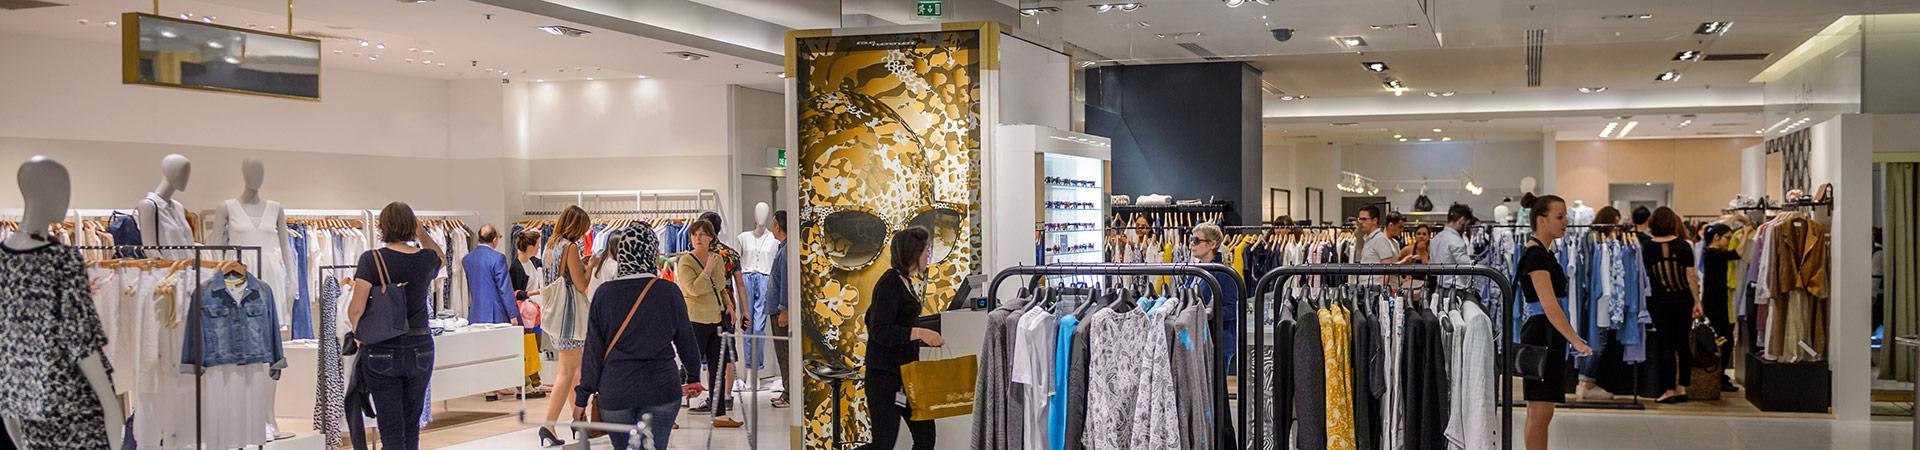 retail-leisure photograph